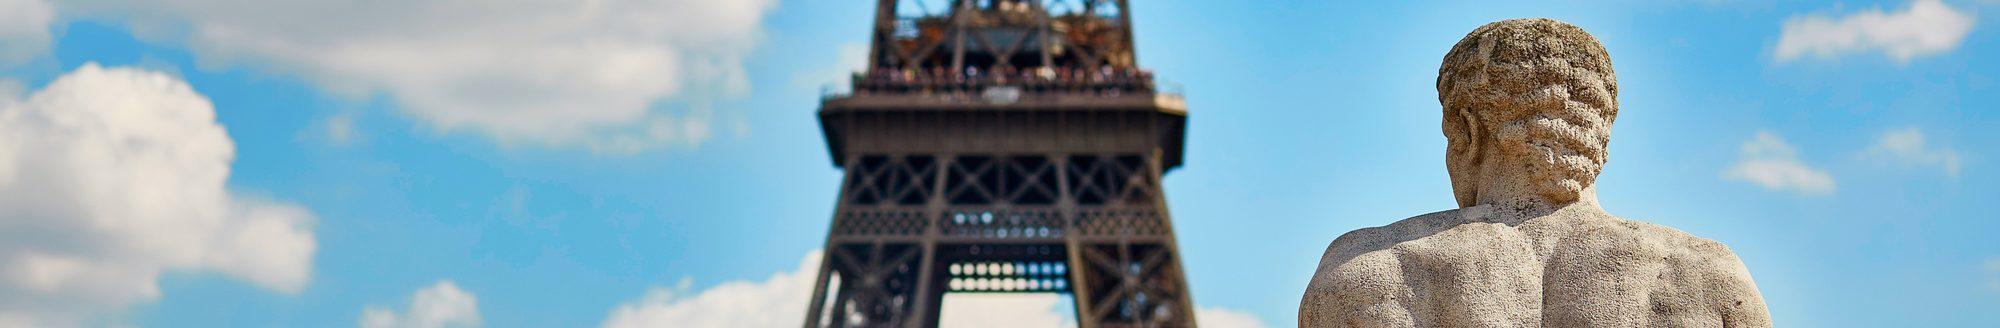 SightseeingTours in Paris